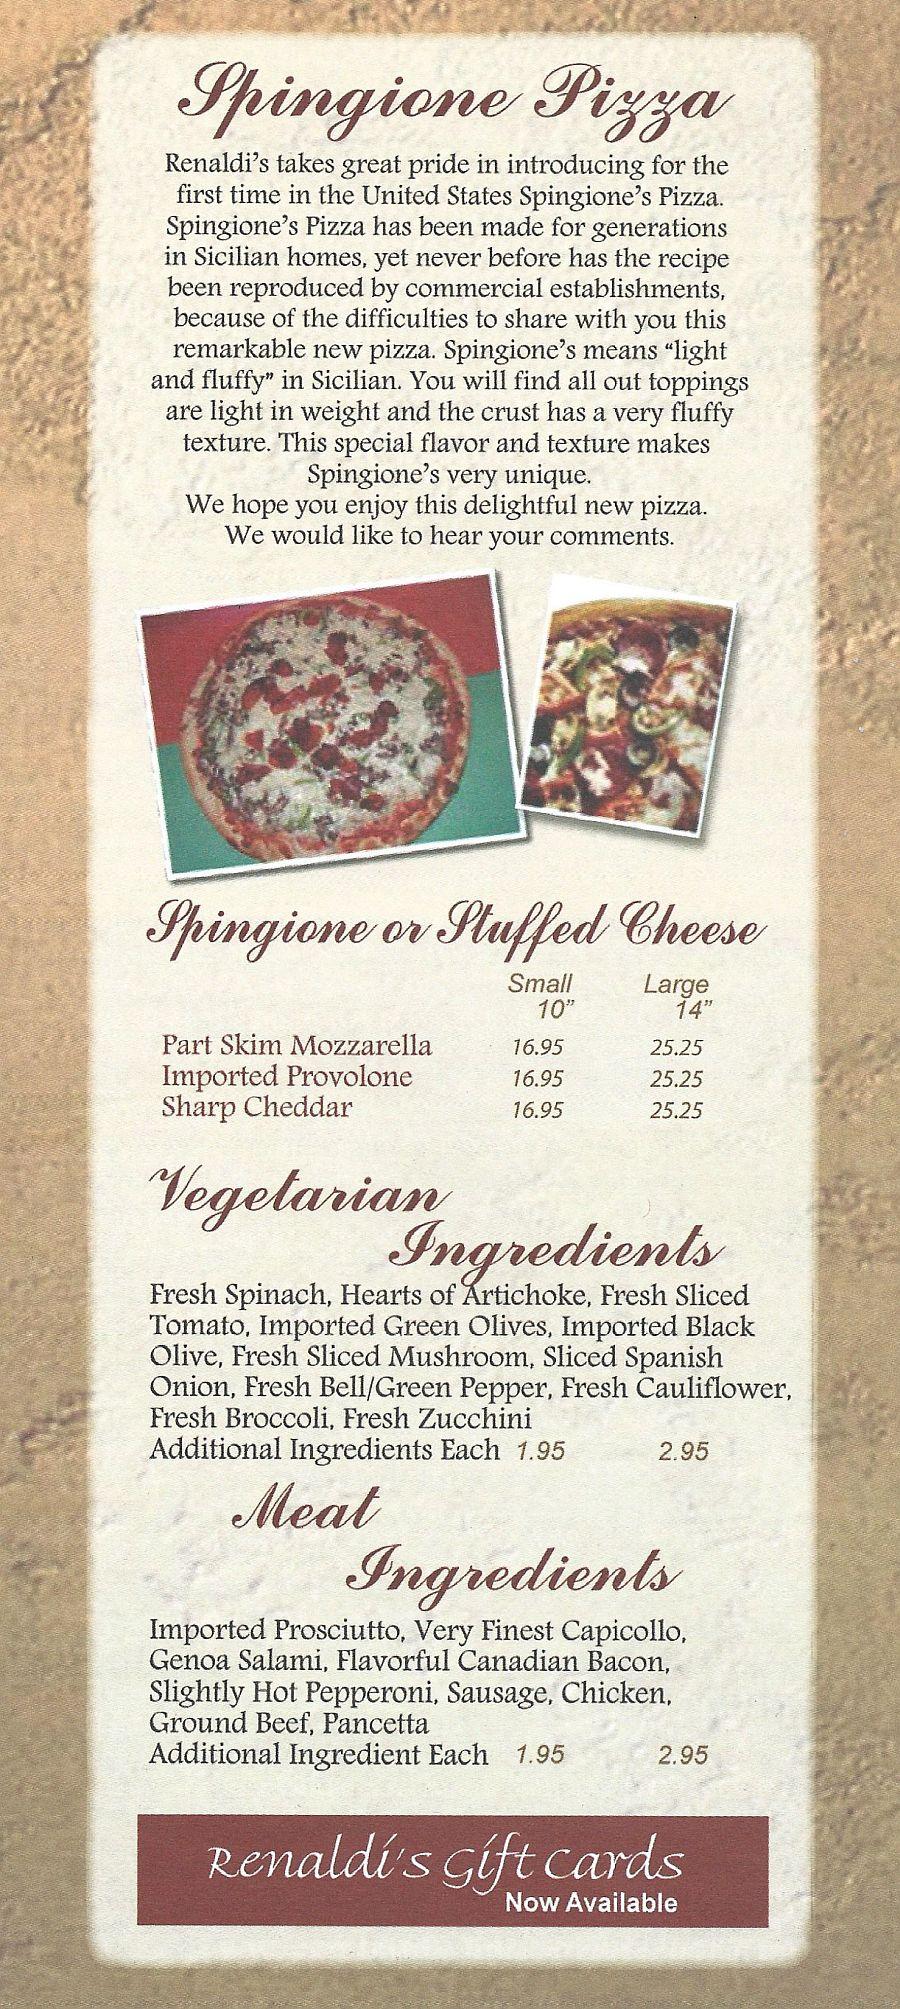 Free Renaldi's pizza chicago coupon code